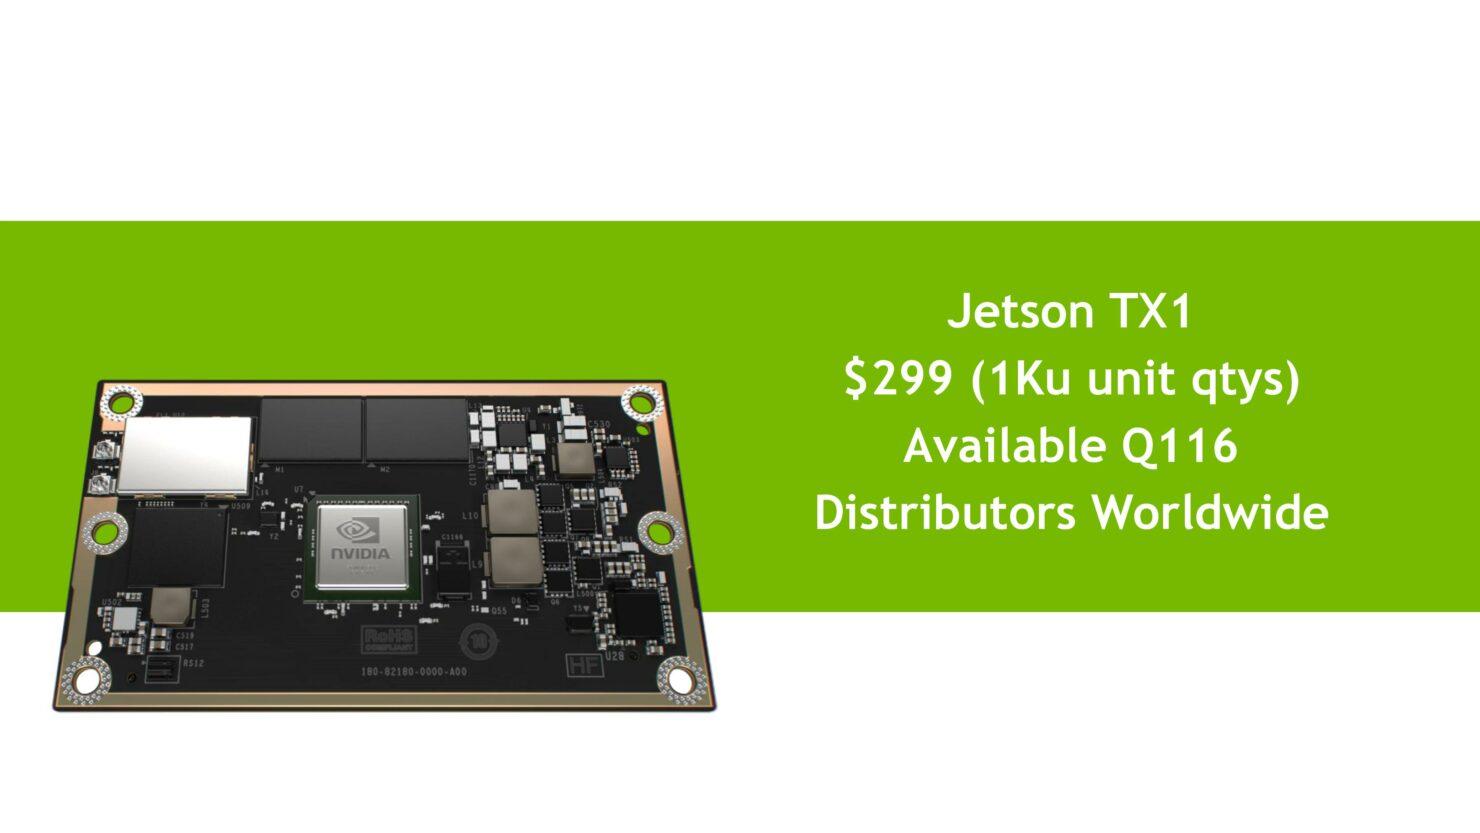 nvidia-jetson-tx1-credit-card